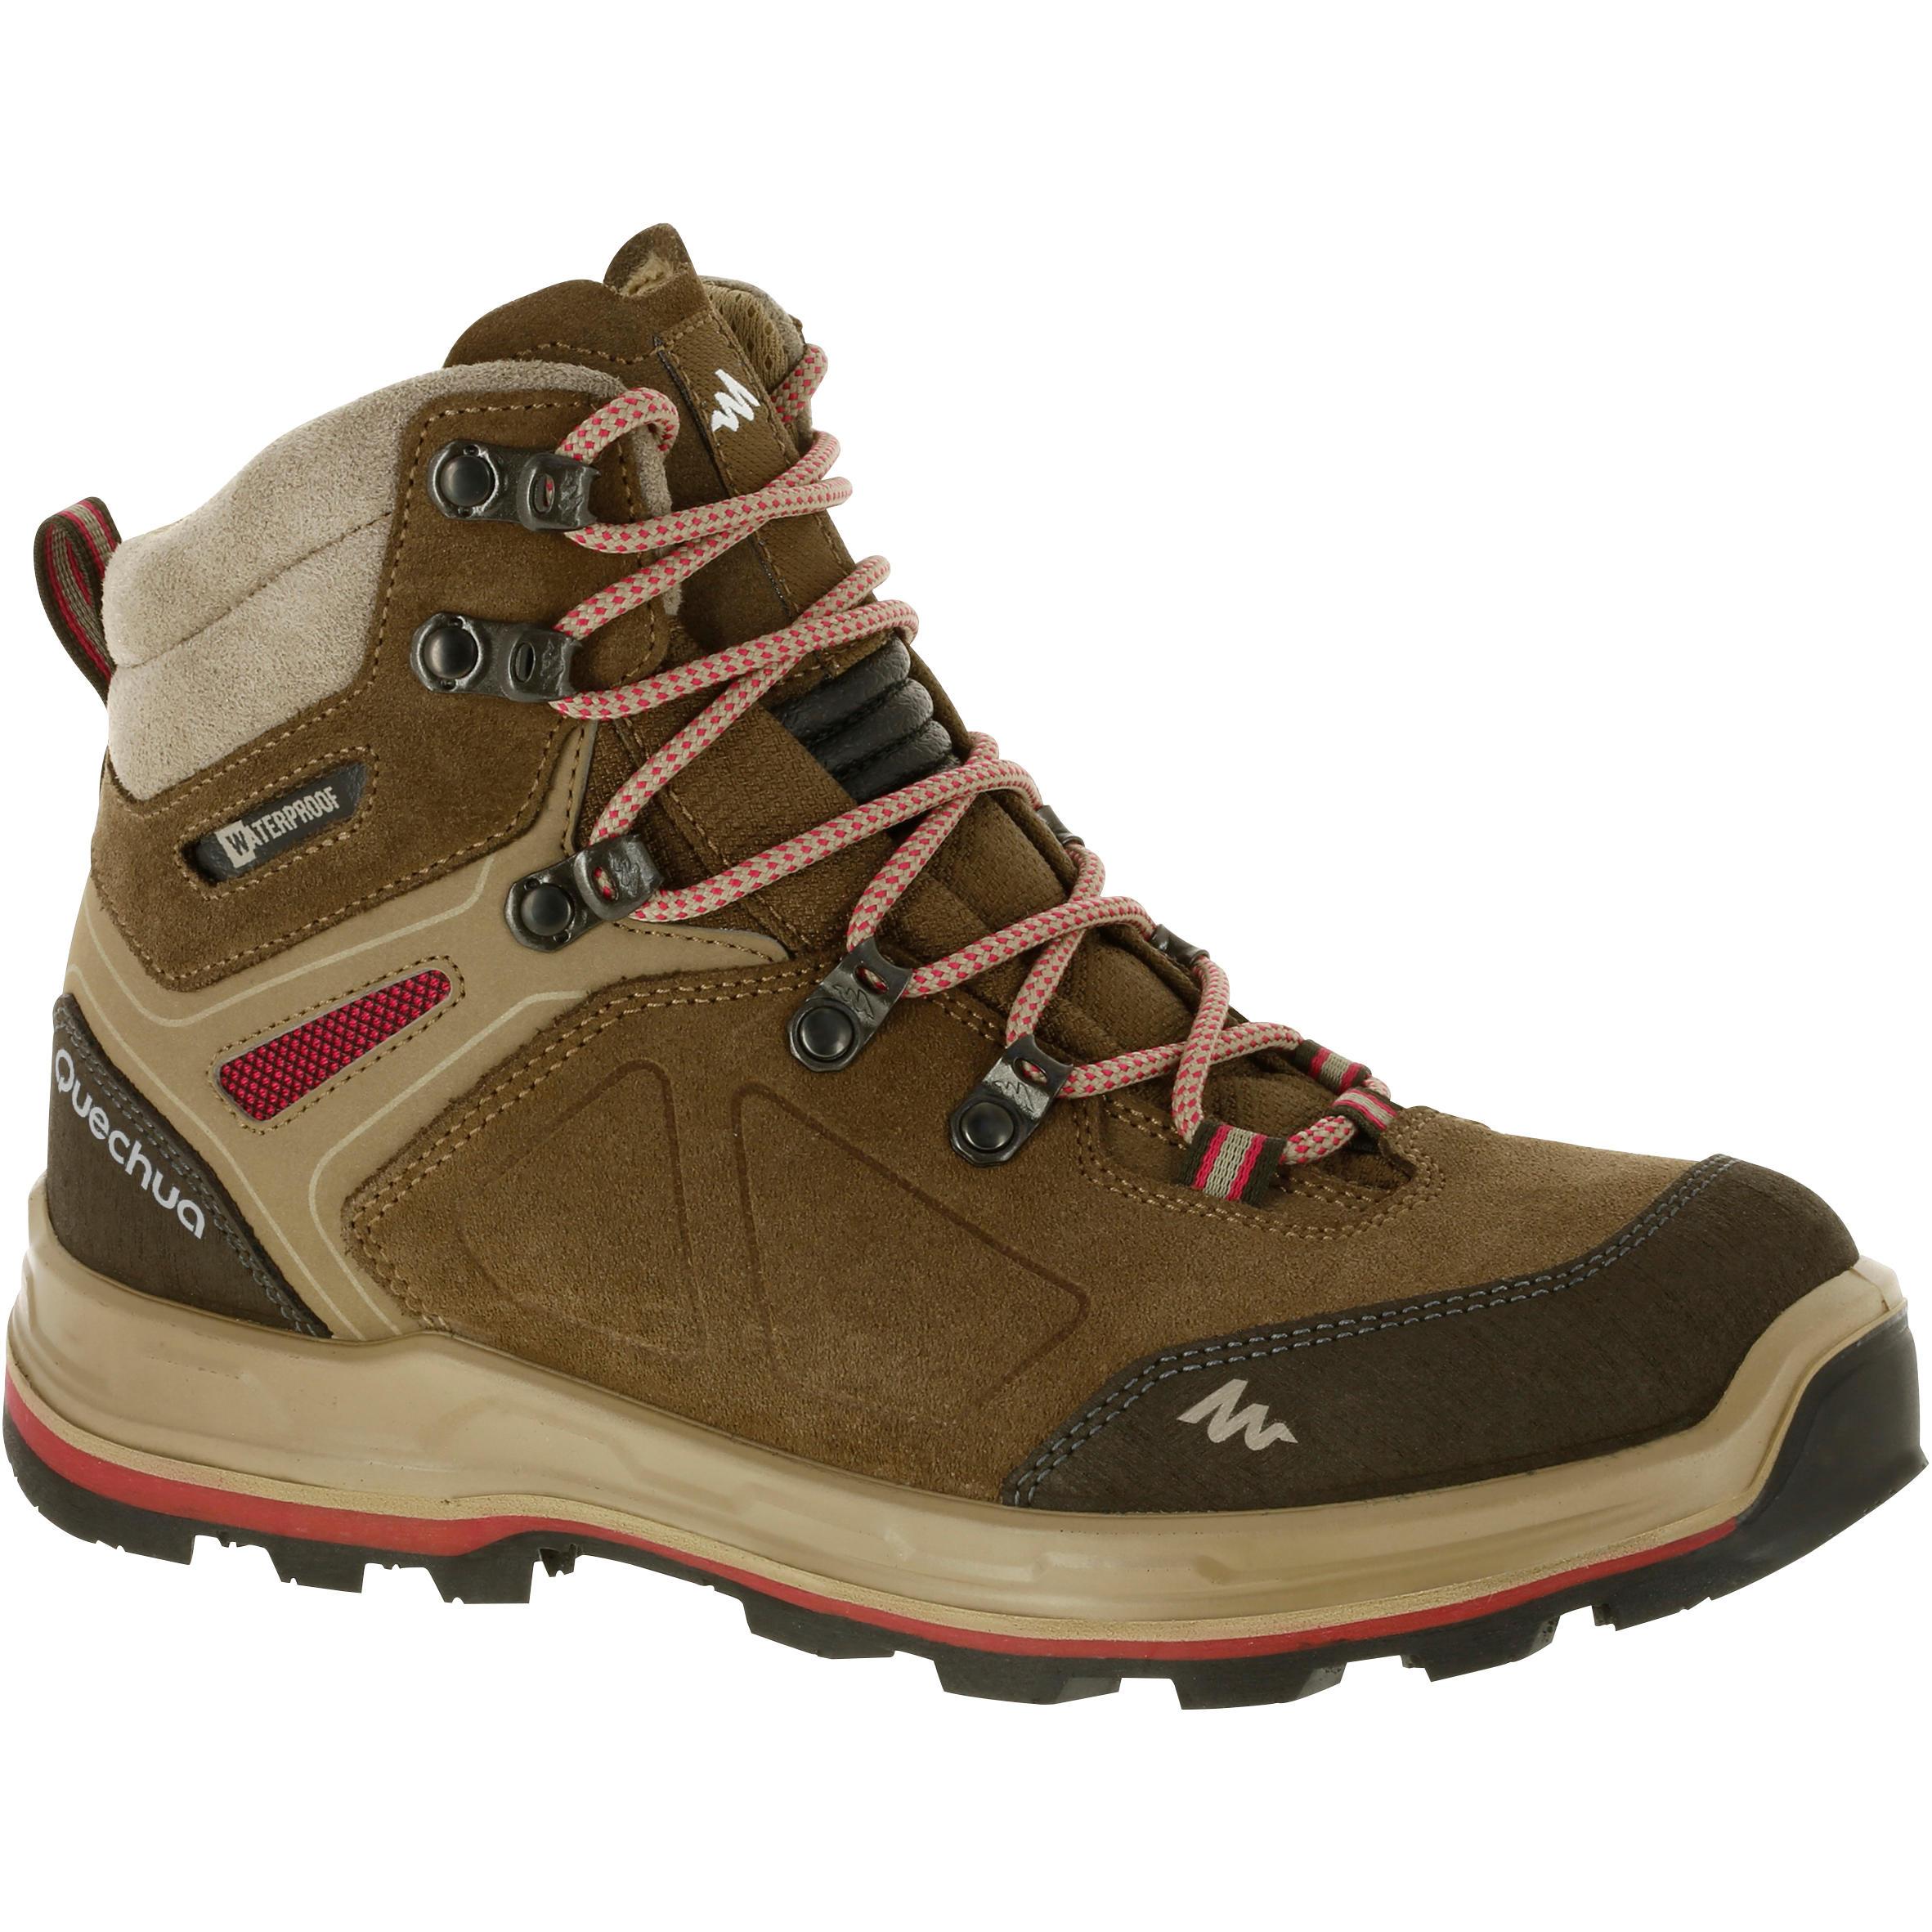 Trek 100 trekking Shoes by Decathlon